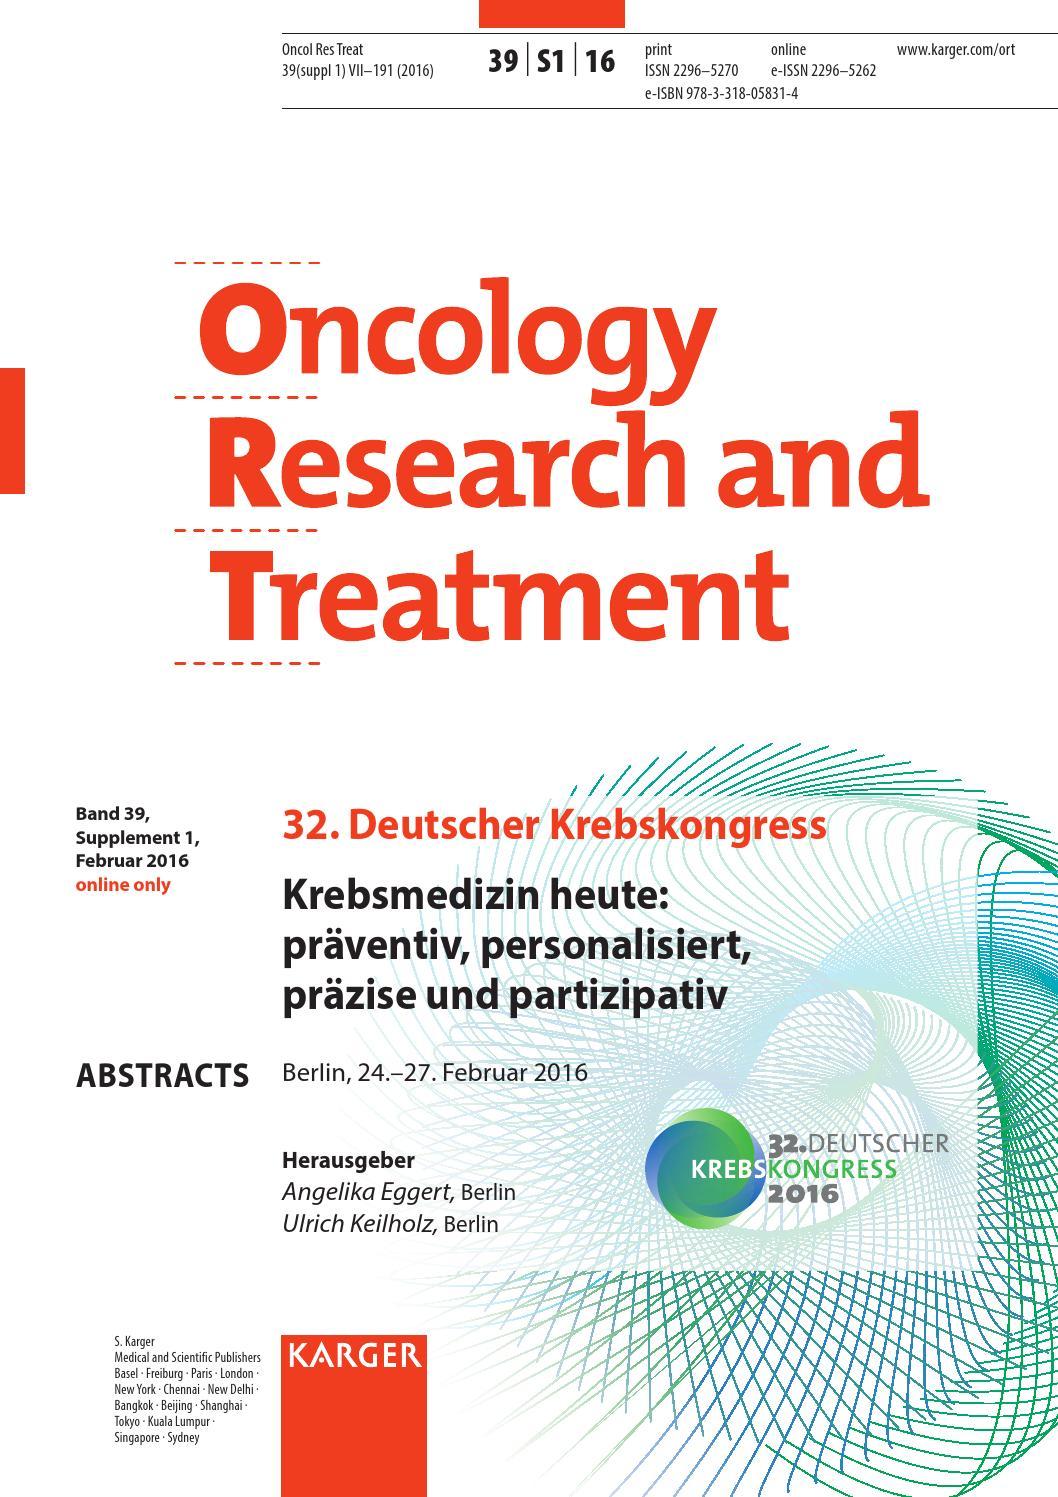 Hpv mann medikamente - Papillomavirus humains oncogenes